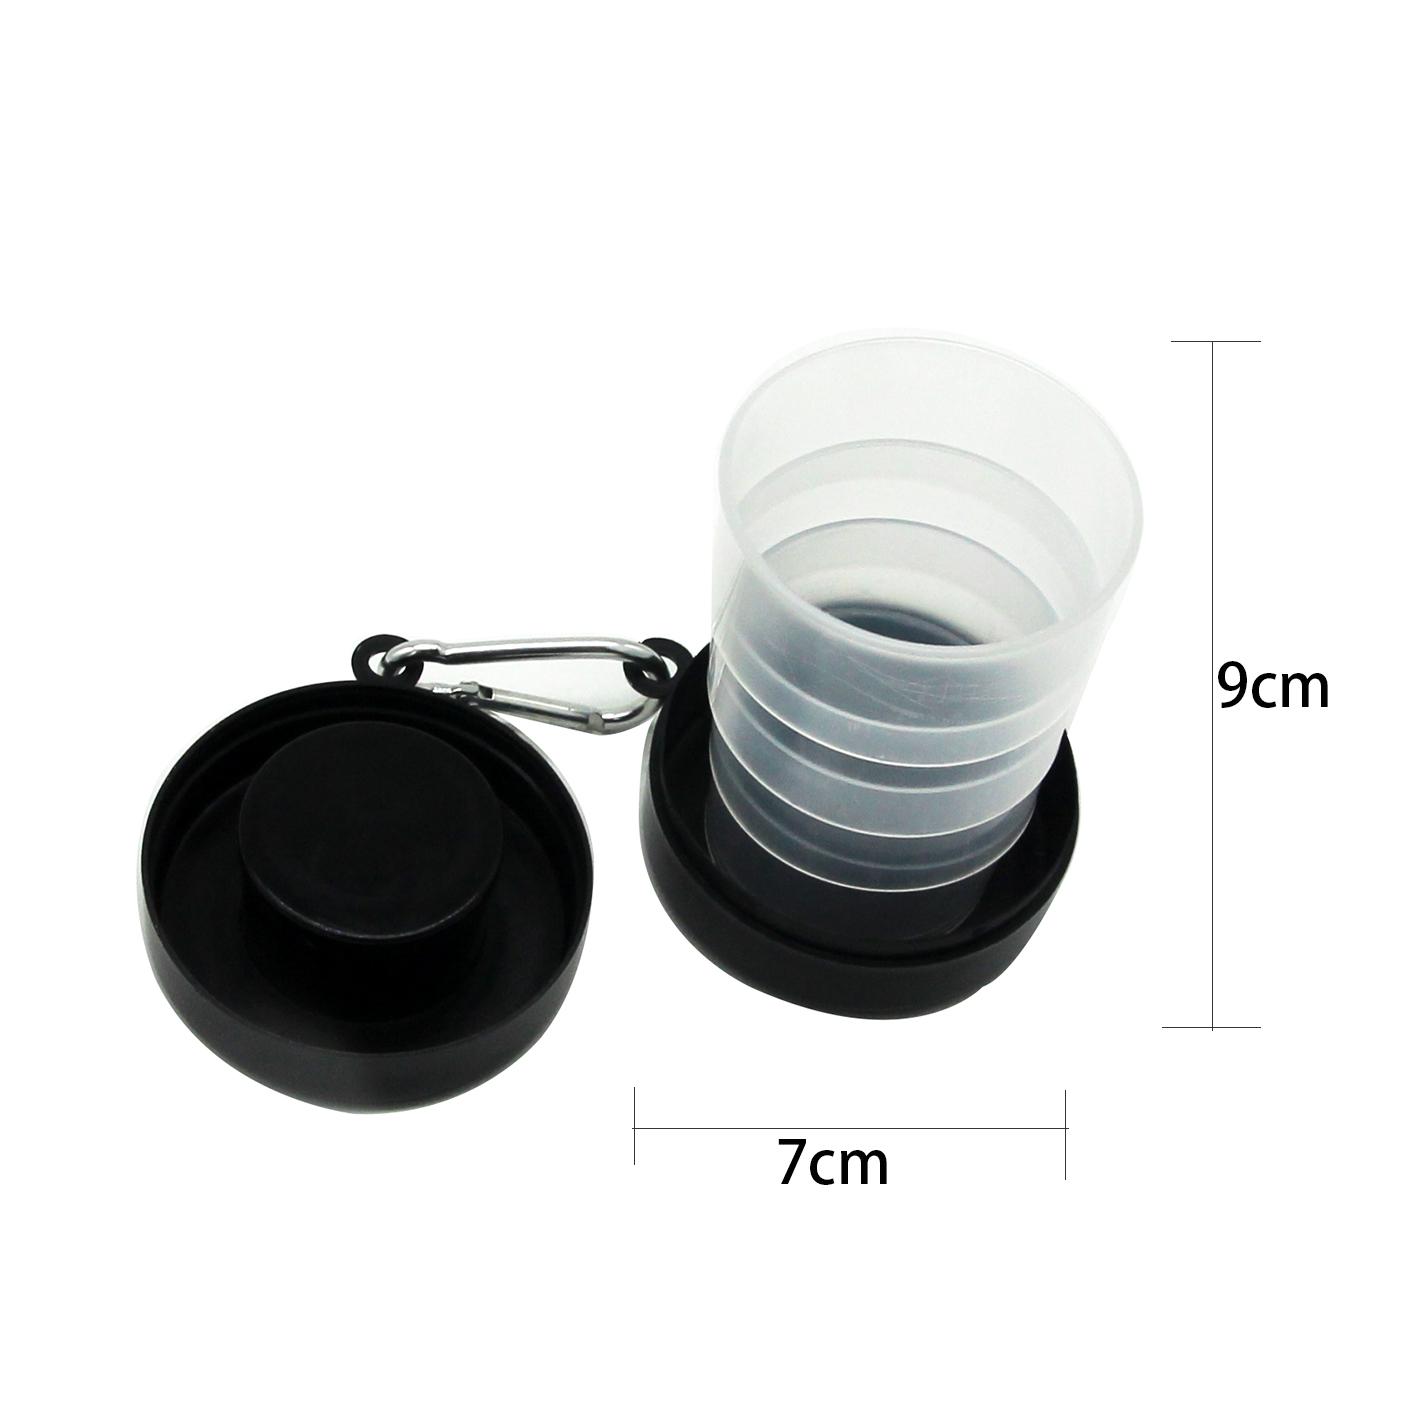 Telescopic Cup Silicone Plastic Travel Folding Cup/Telescopic Plastic Travel Folding Cup